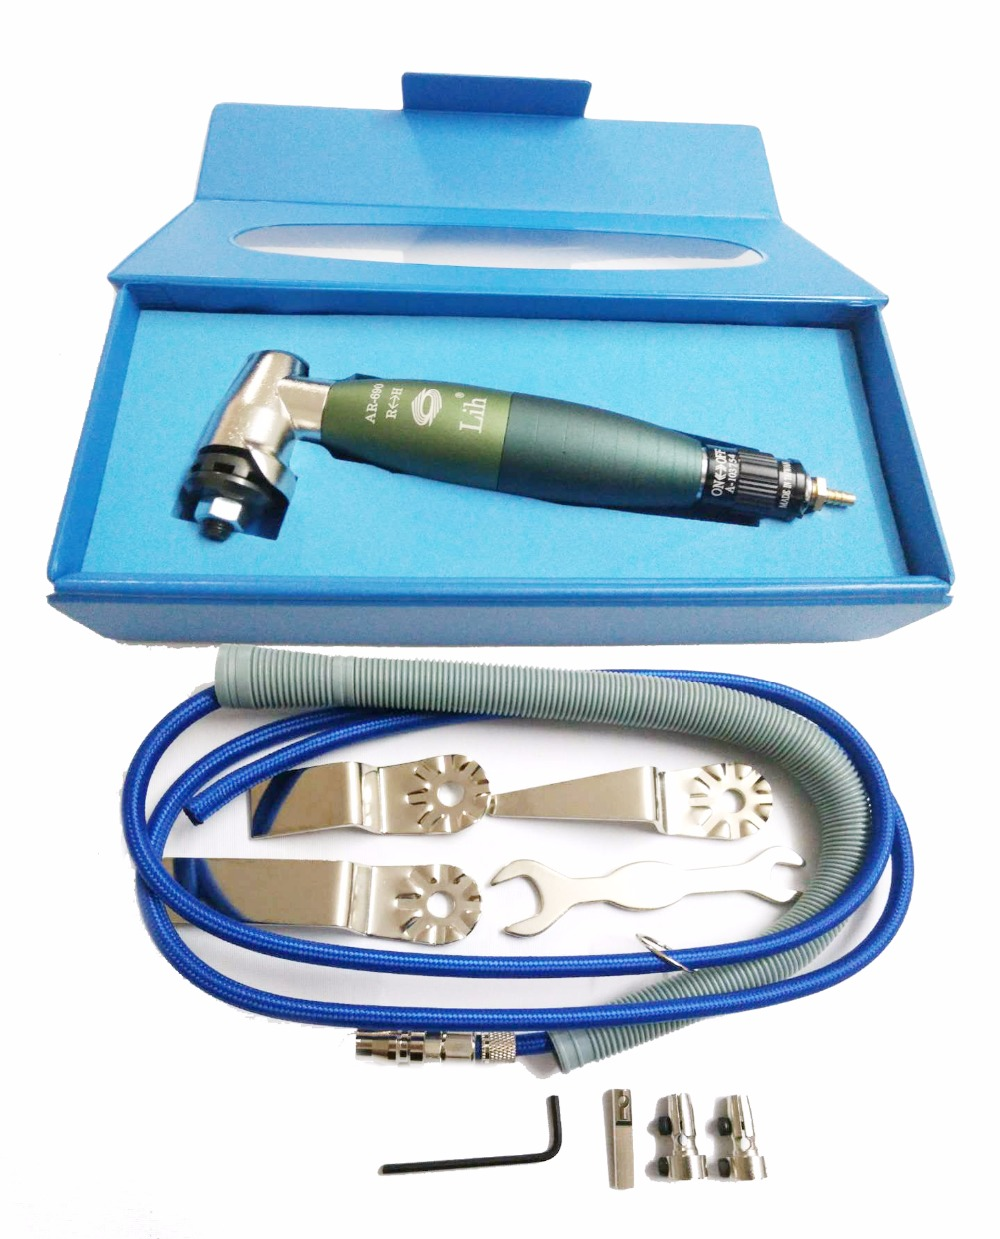 где купить Pneumatic Tools Air Tools AR-690 Air Lapper Turbolap Lapping Grinding Tools Turbolap Linear Saw Windshield Cutter Knife Set по лучшей цене